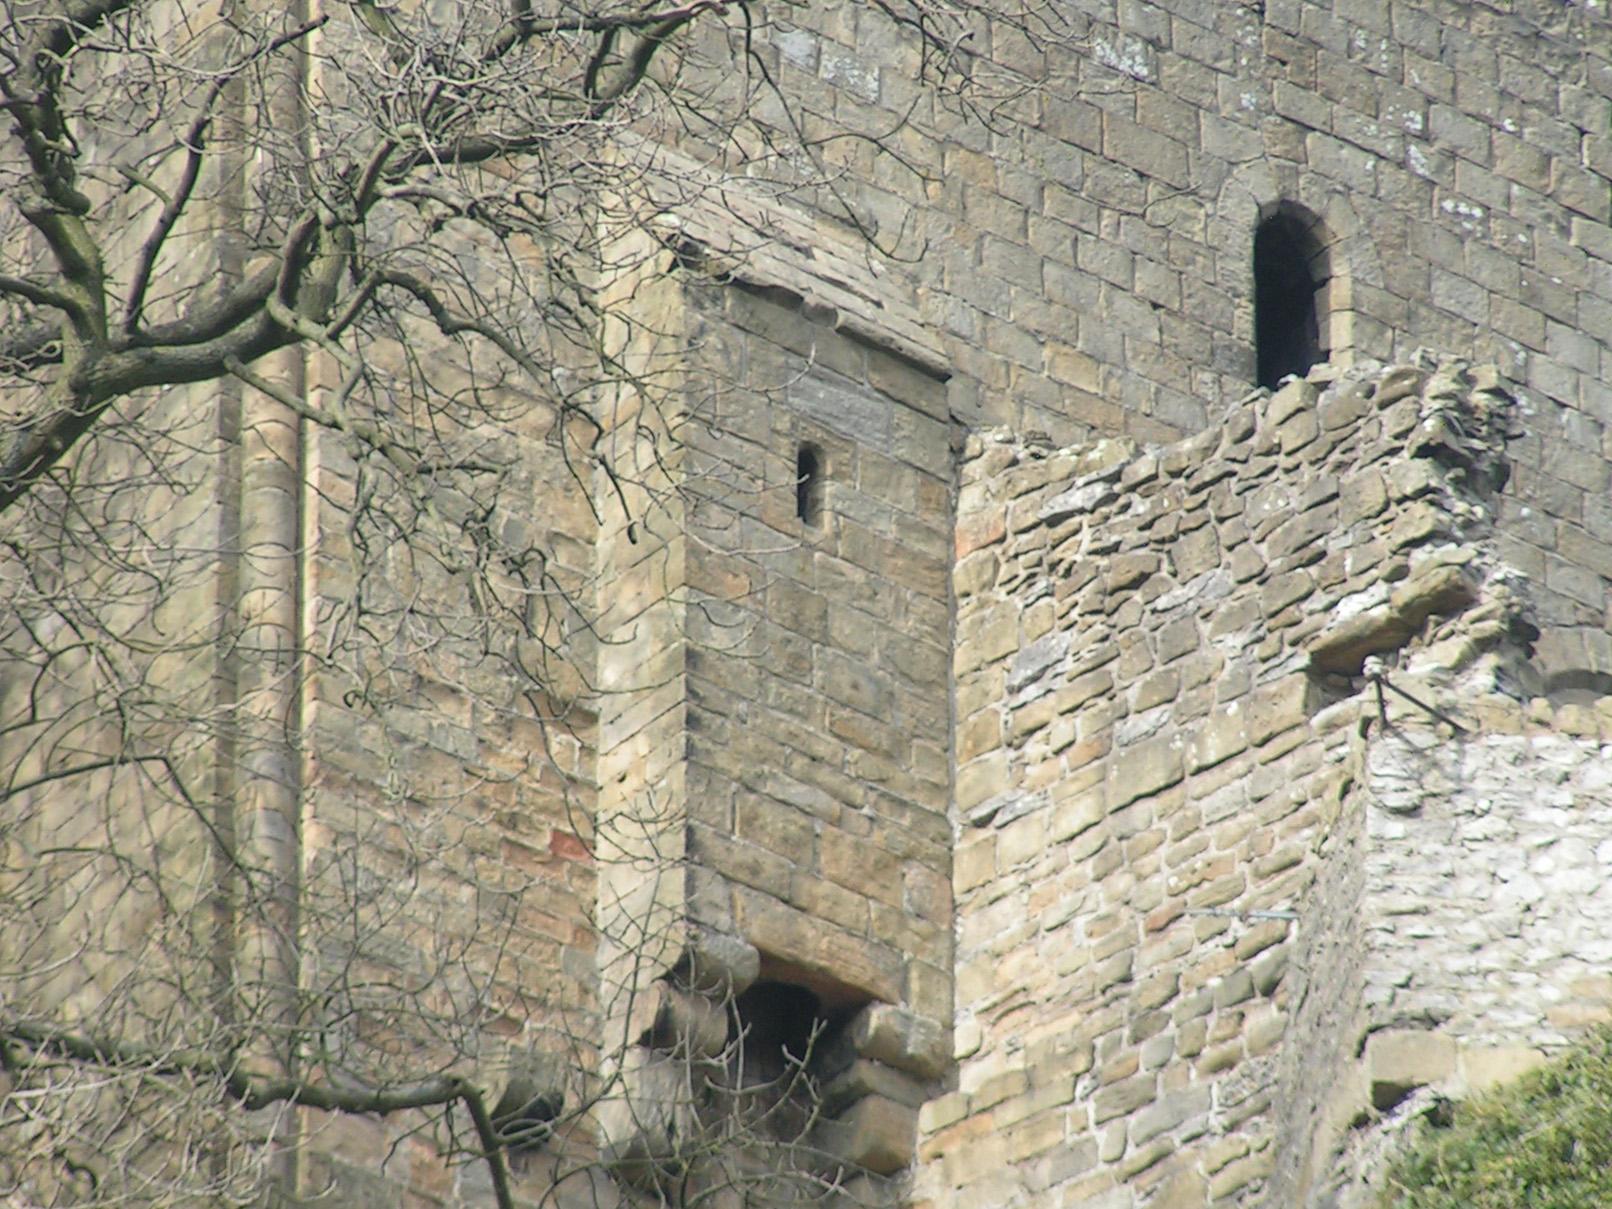 file garderobe peveril castle wikimedia commons. Black Bedroom Furniture Sets. Home Design Ideas